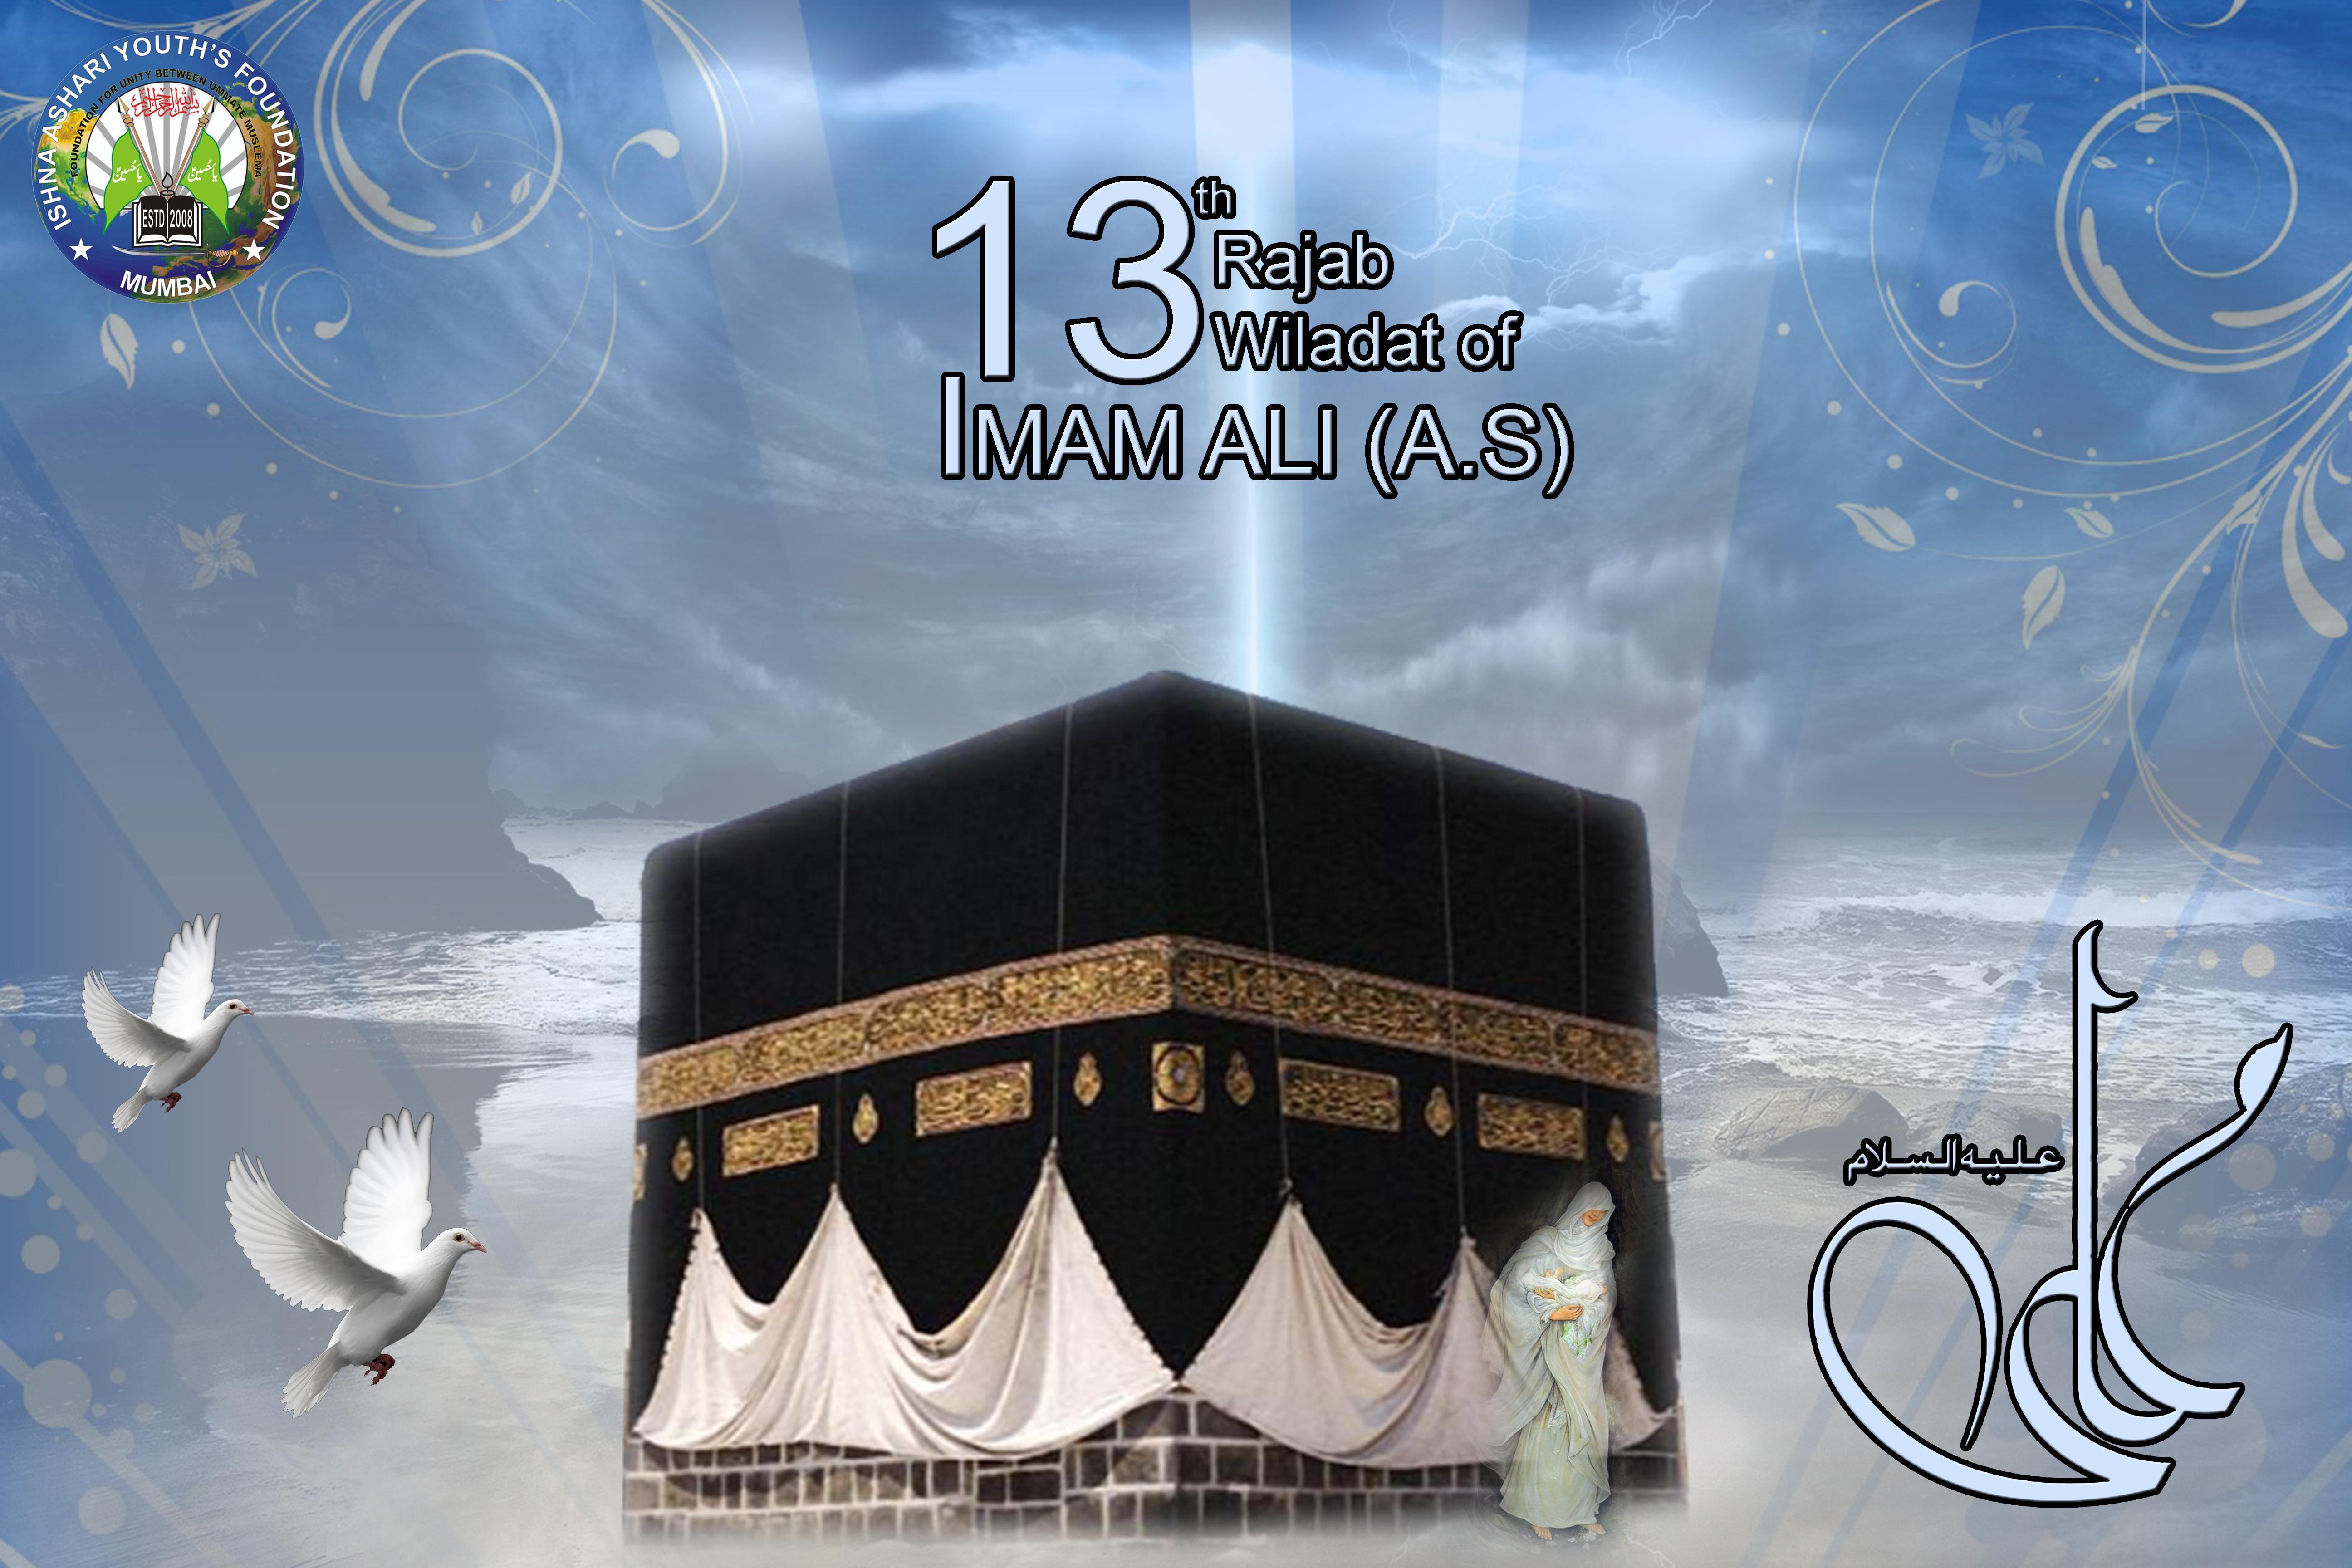 13th Rajab Wiladat of IMAM ALI (a.s.) by iayf on DeviantArt  Wiladat